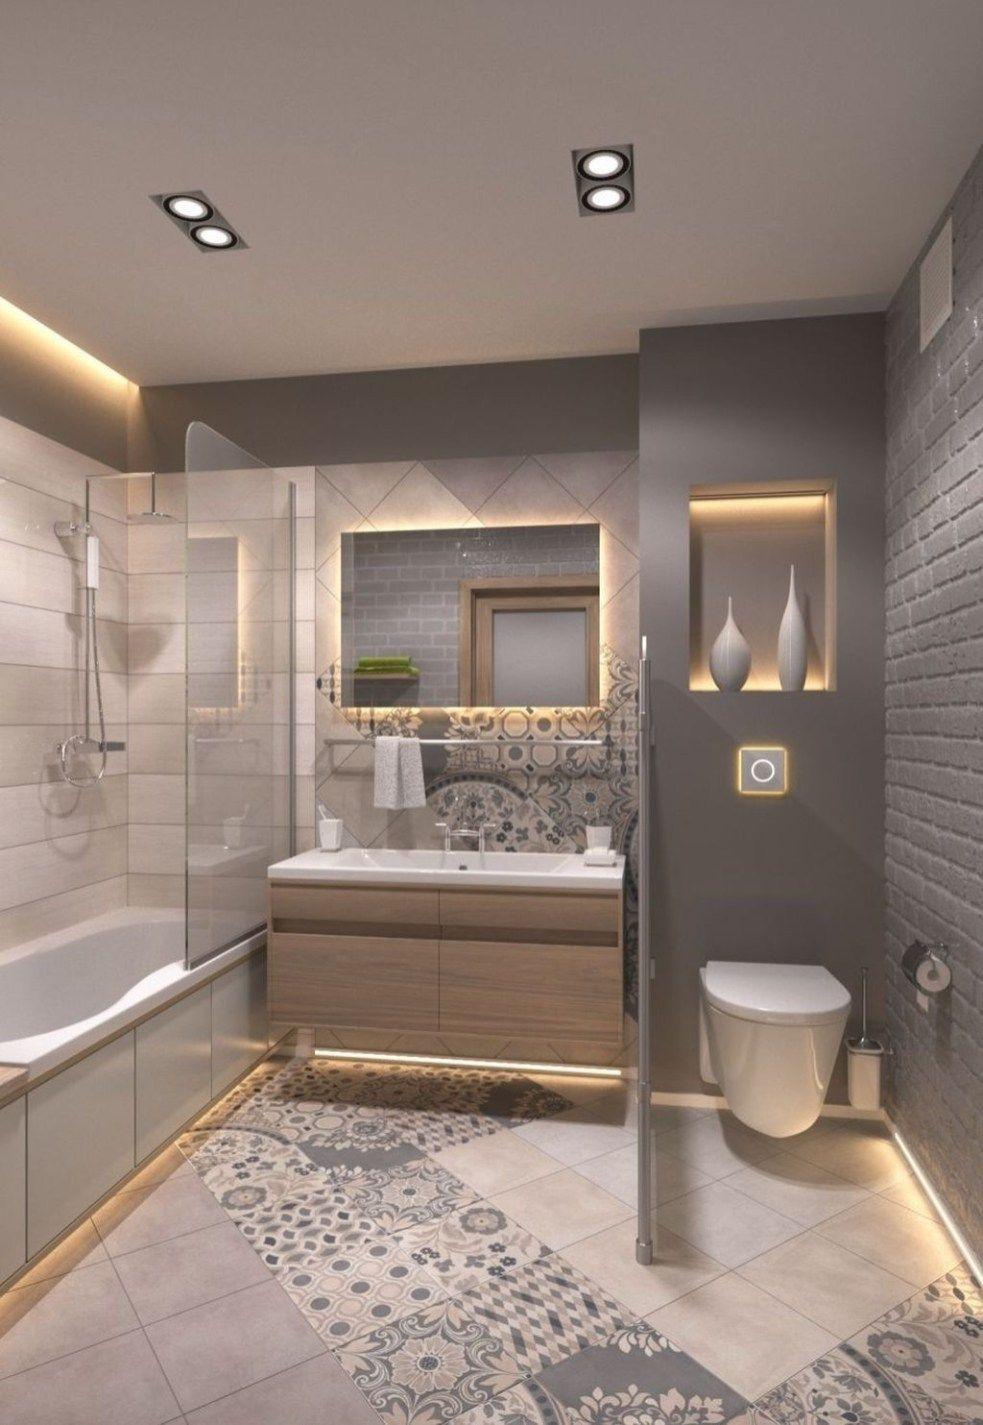 Fresh And Stylish Small Bathroom Remodel Add Storage Ideas Before After Small Bathroom Rem Small Bathroom Styles Small Master Bathroom Bathroom Design Small